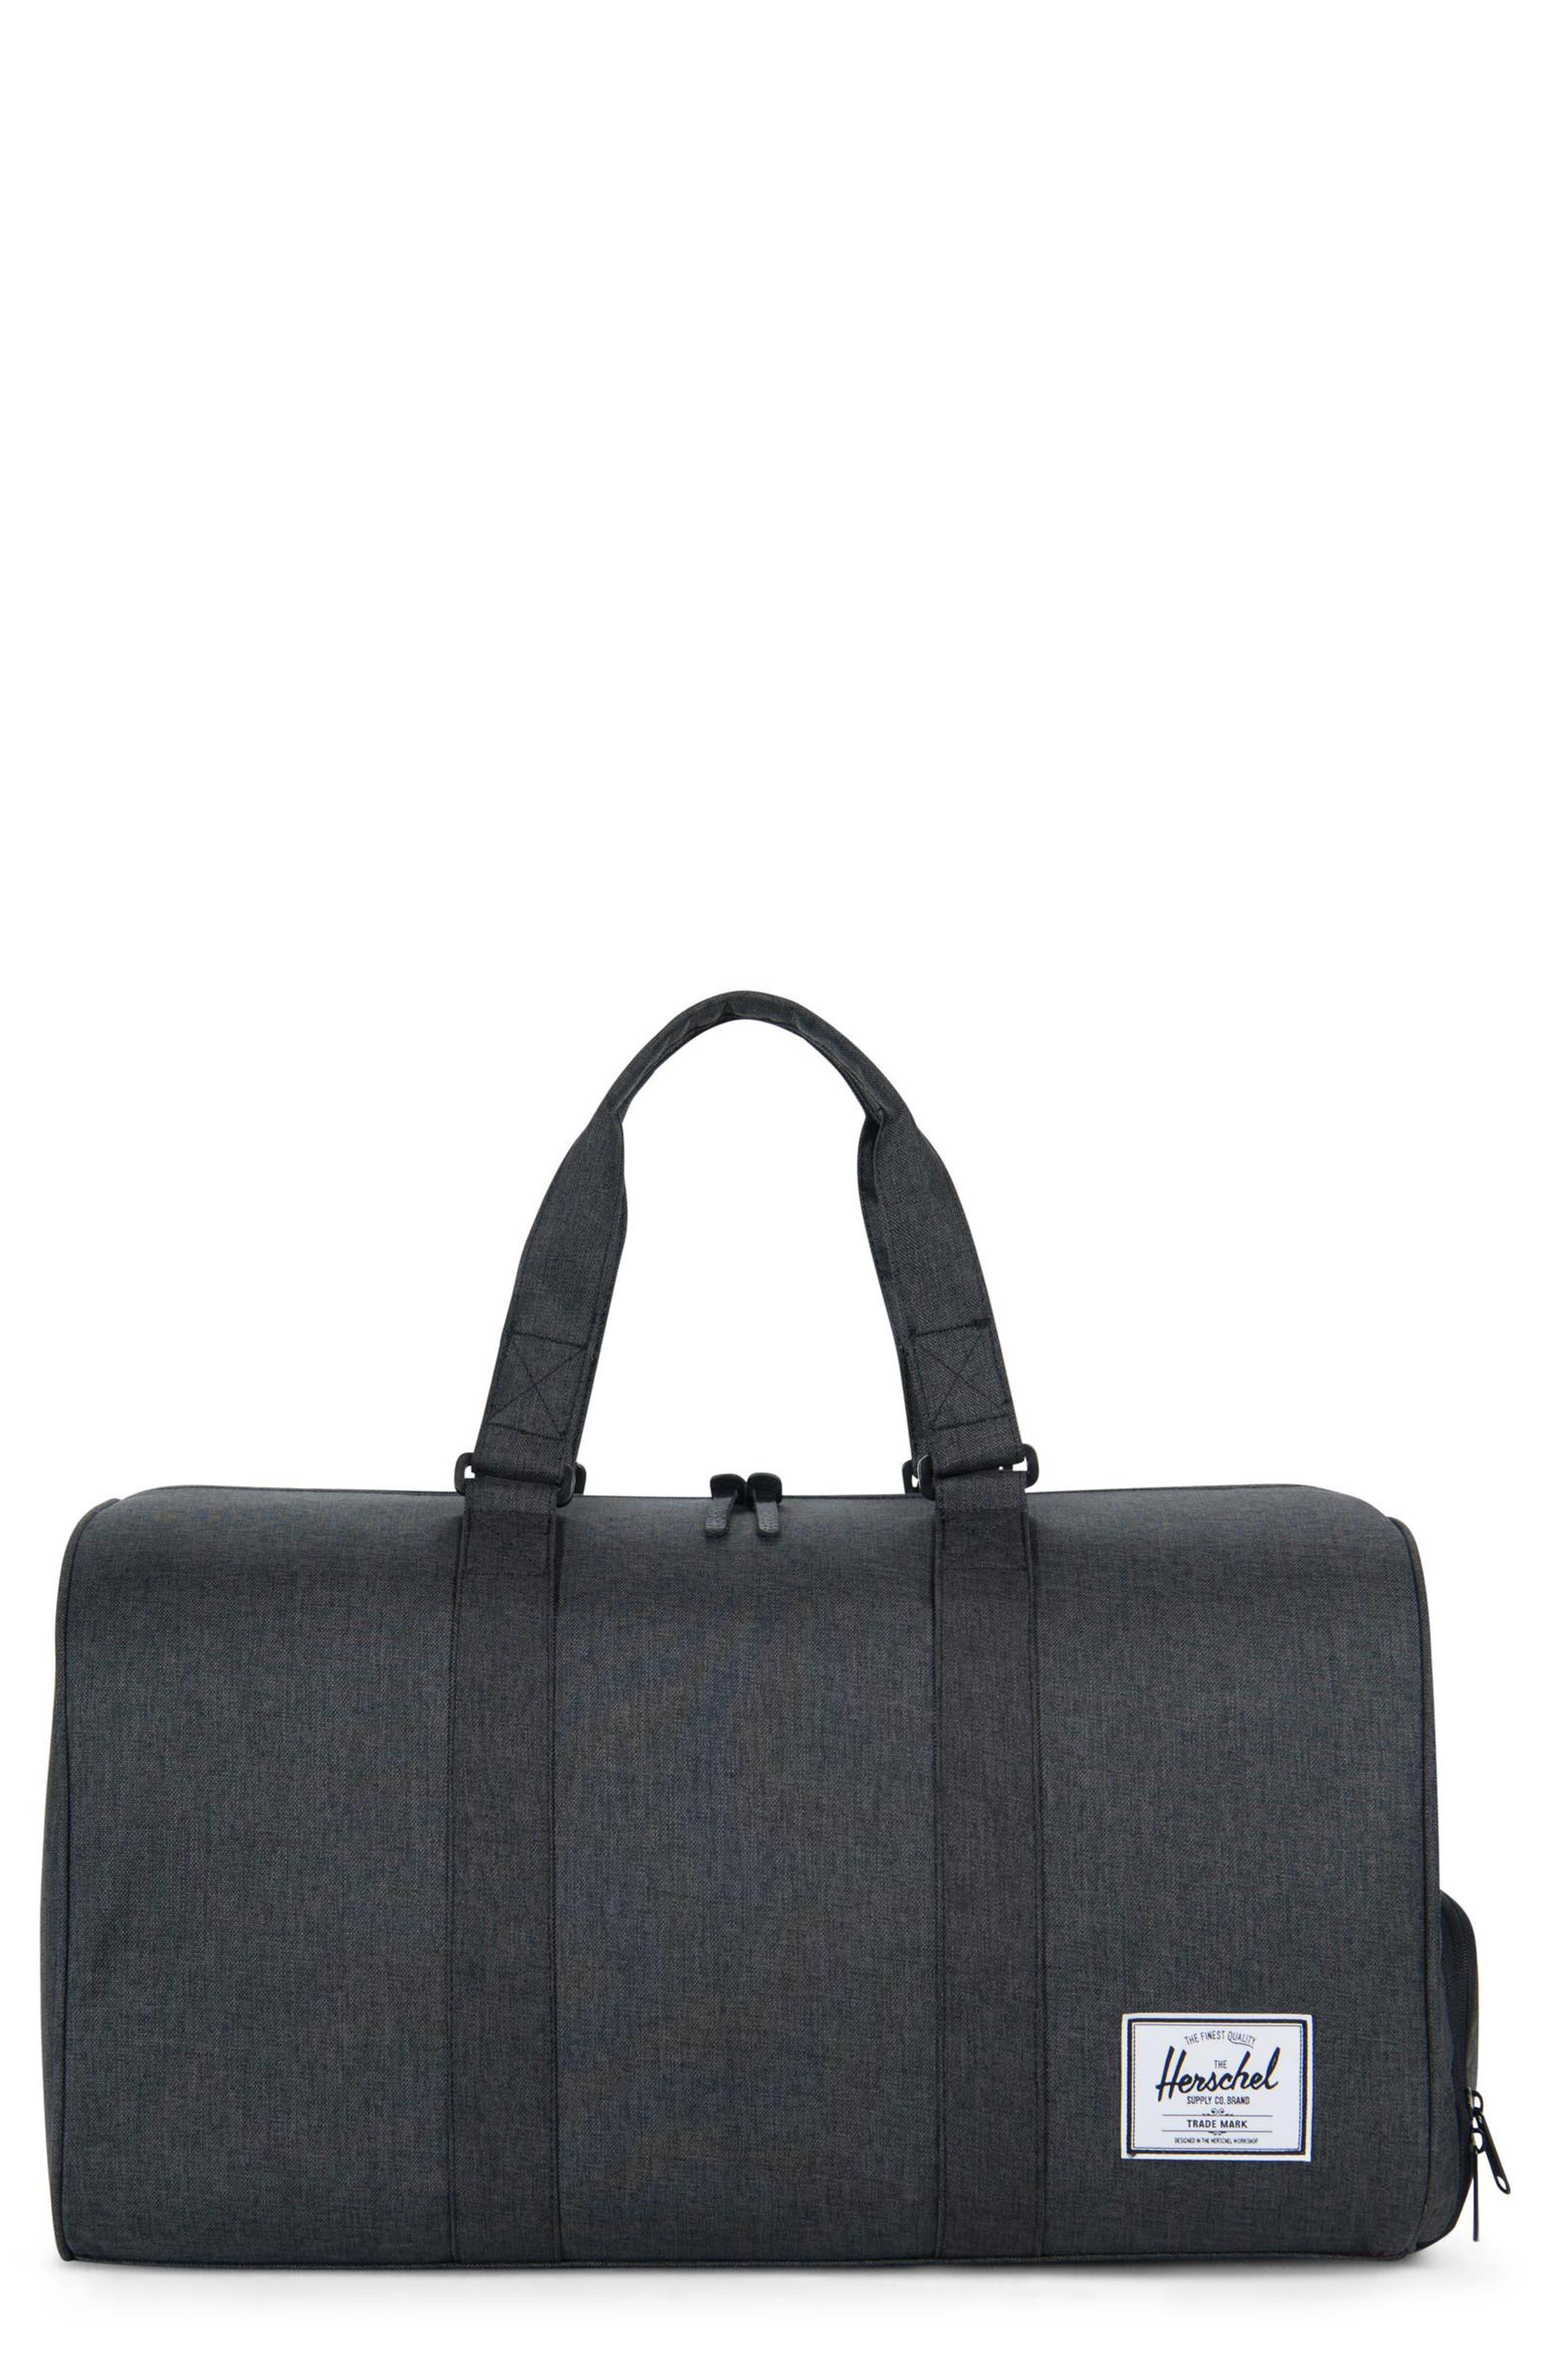 HERSCHEL SUPPLY CO. Novel Duffel Bag - Black in Black Crosshatch